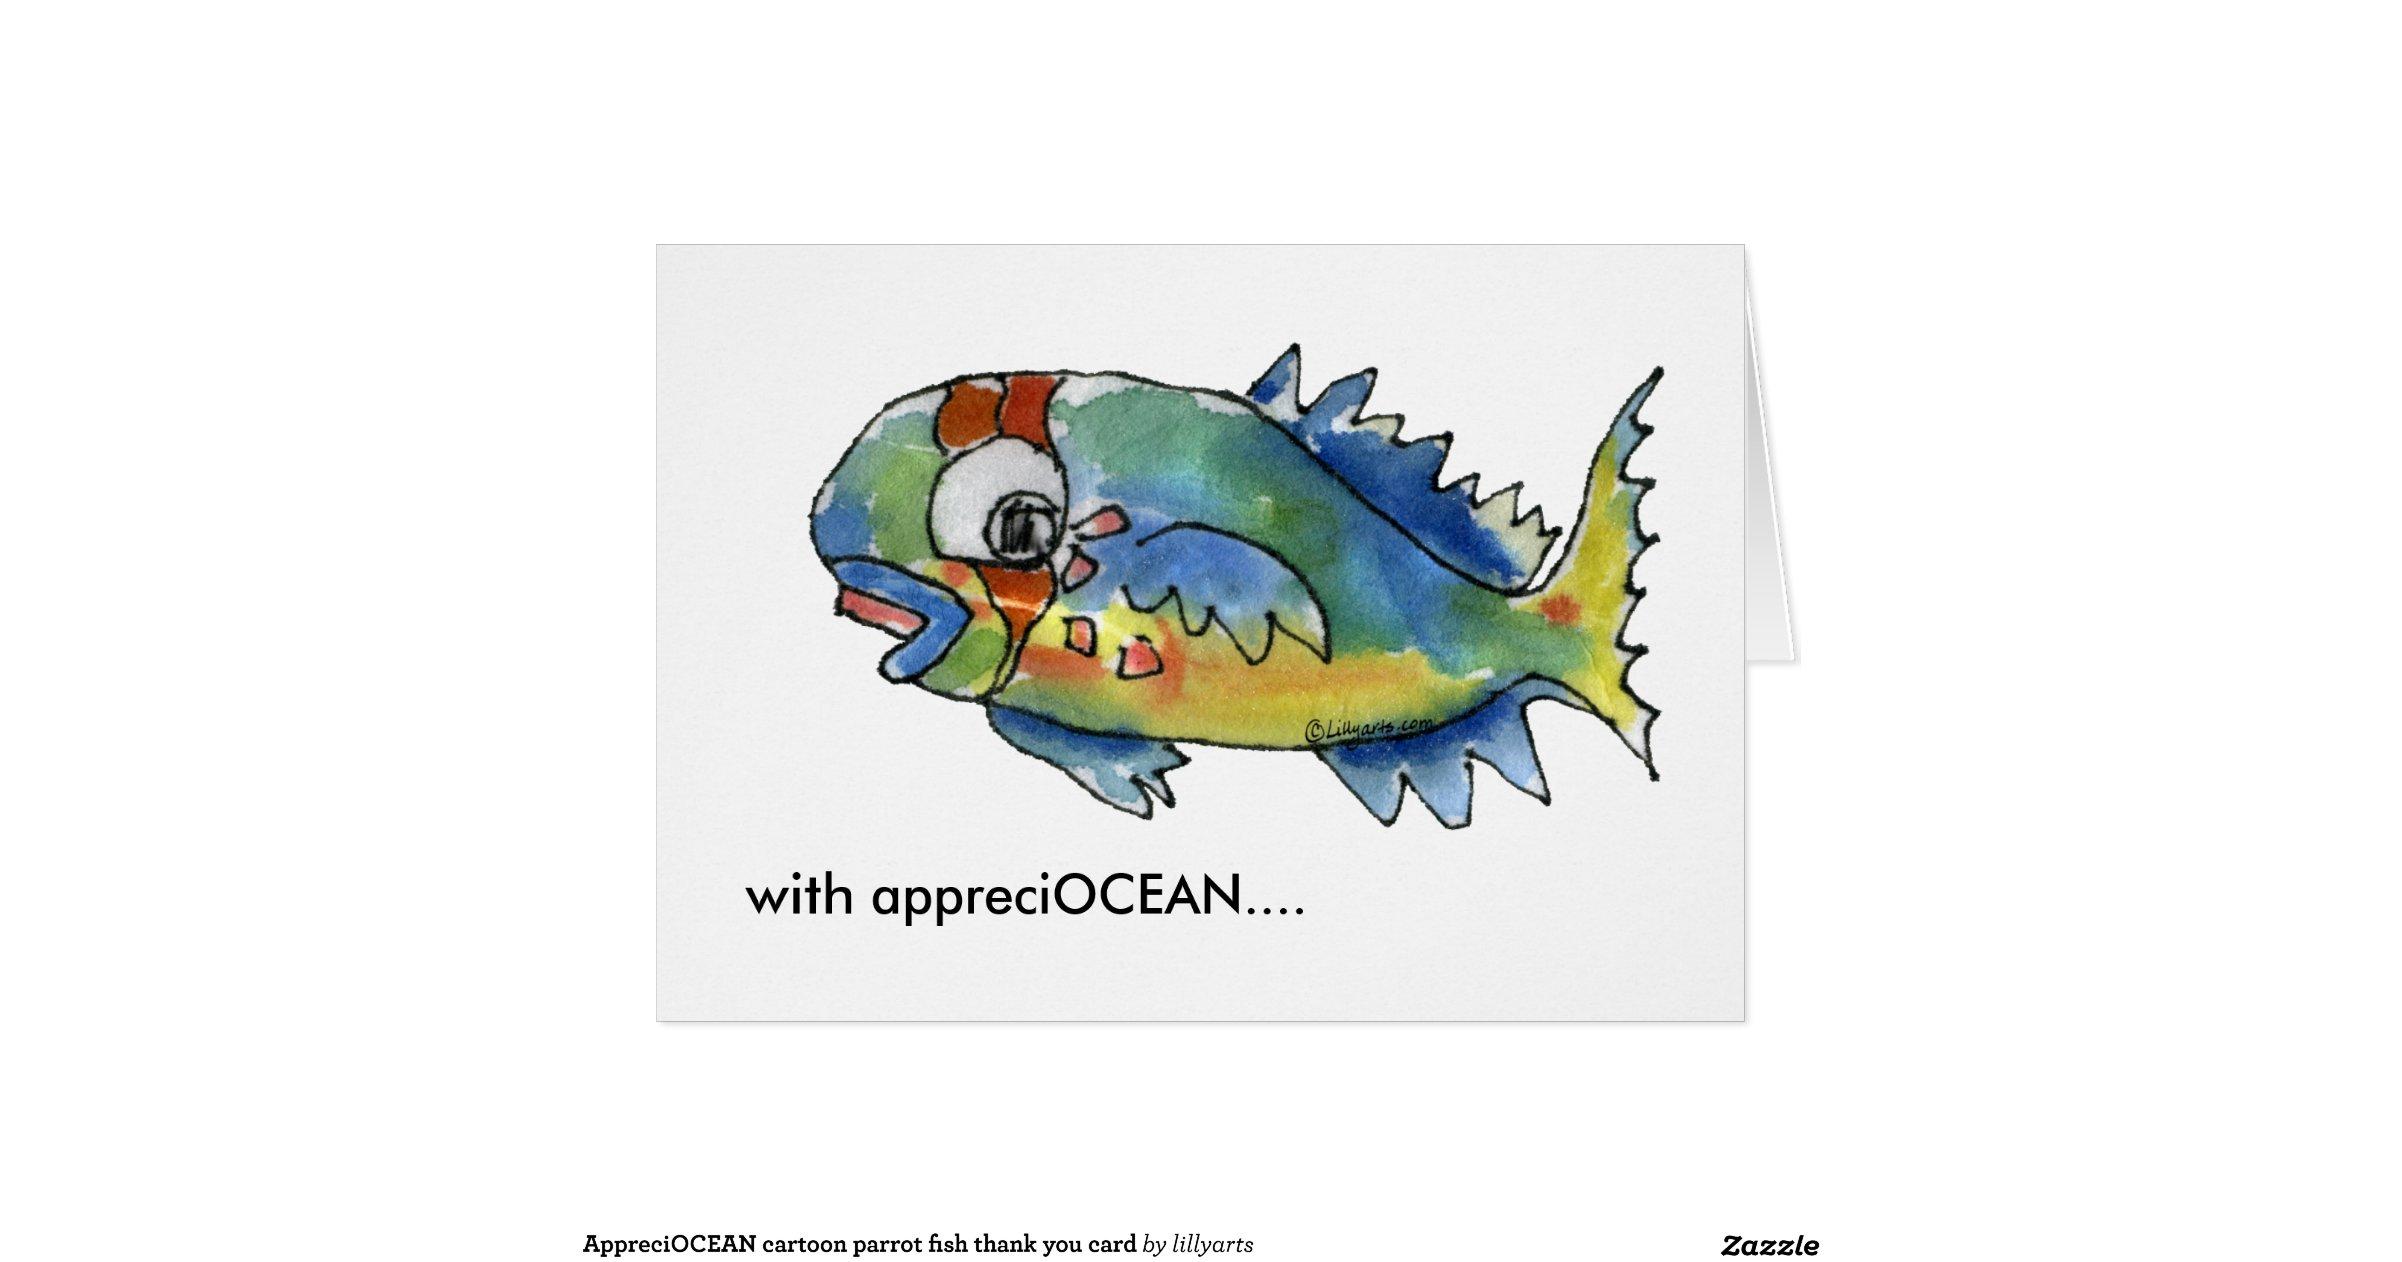 Appreciocean Cartoon Parrot Fish Thank You Card